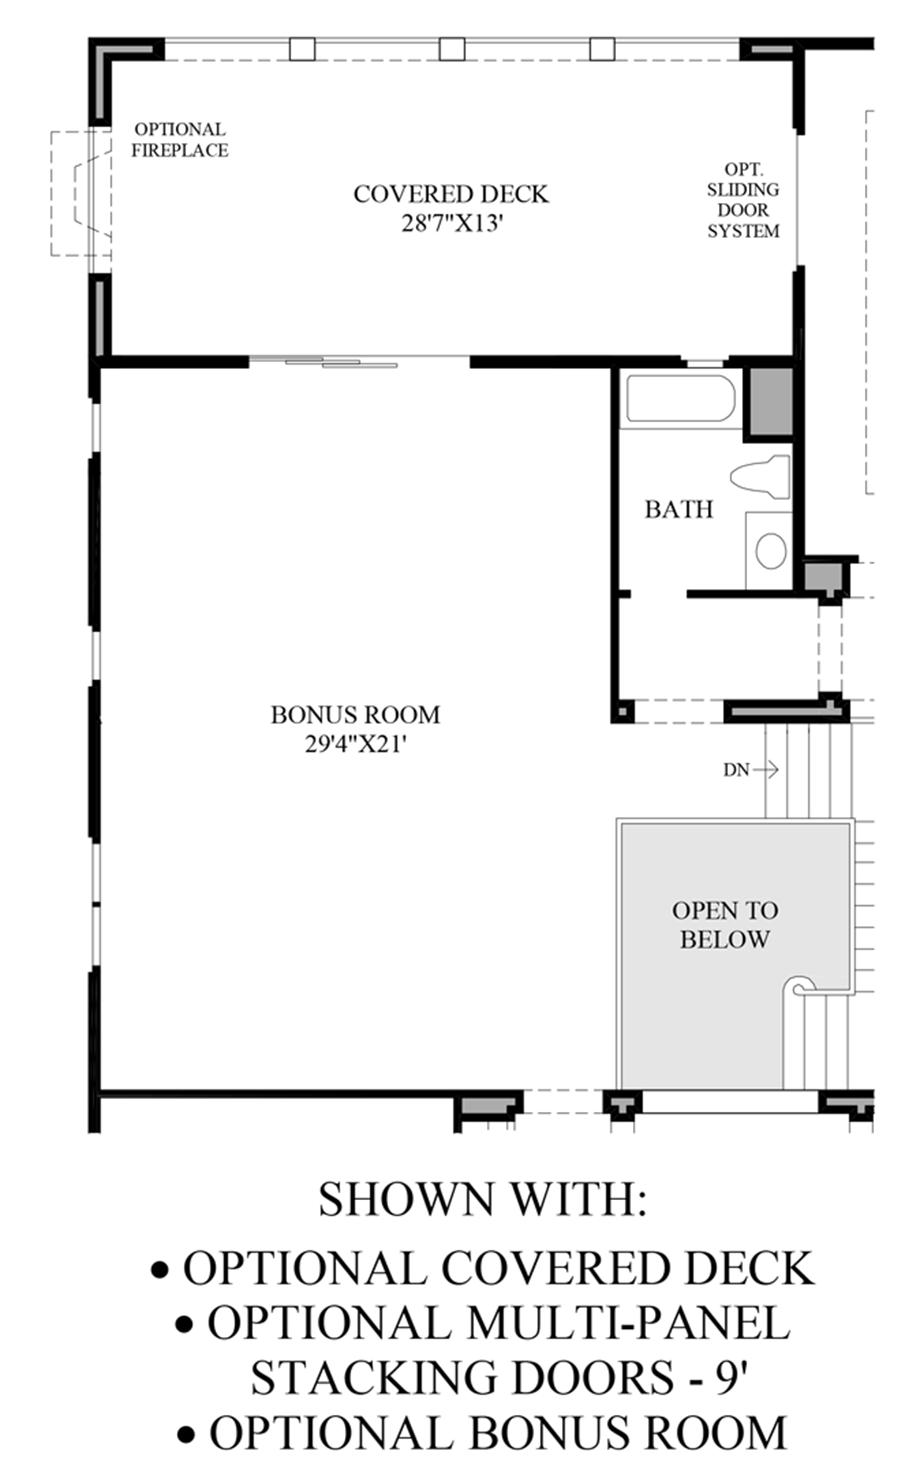 Optional Covered Deck, Multi-Panel Stacking Doors and Bonus Room Floor Plan